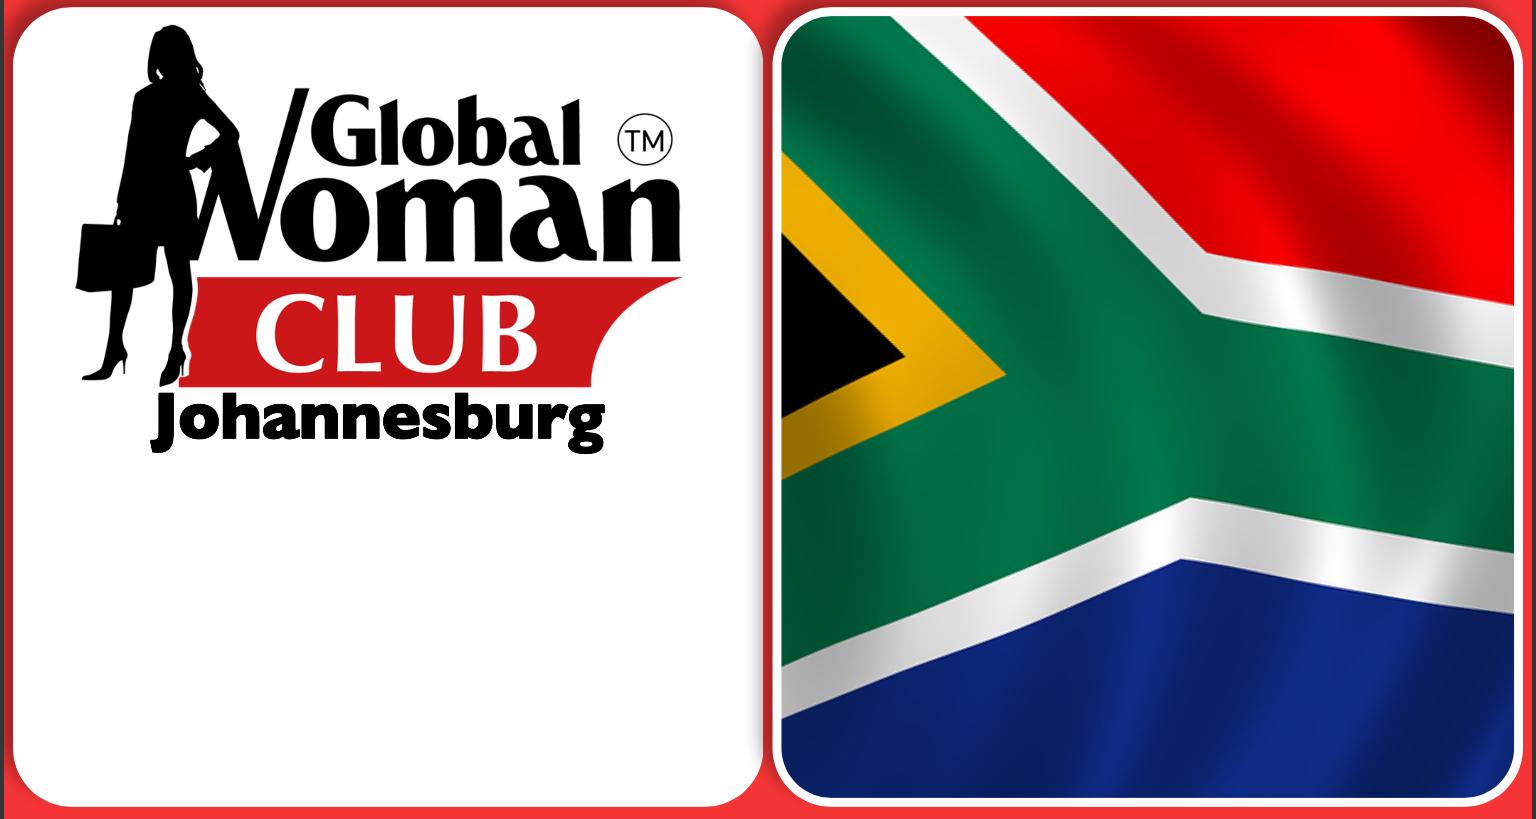 GLOBAL WOMAN CLUB JOHANNESBURG: BUSINESS NETWORKING MEETING - NOVEMBER